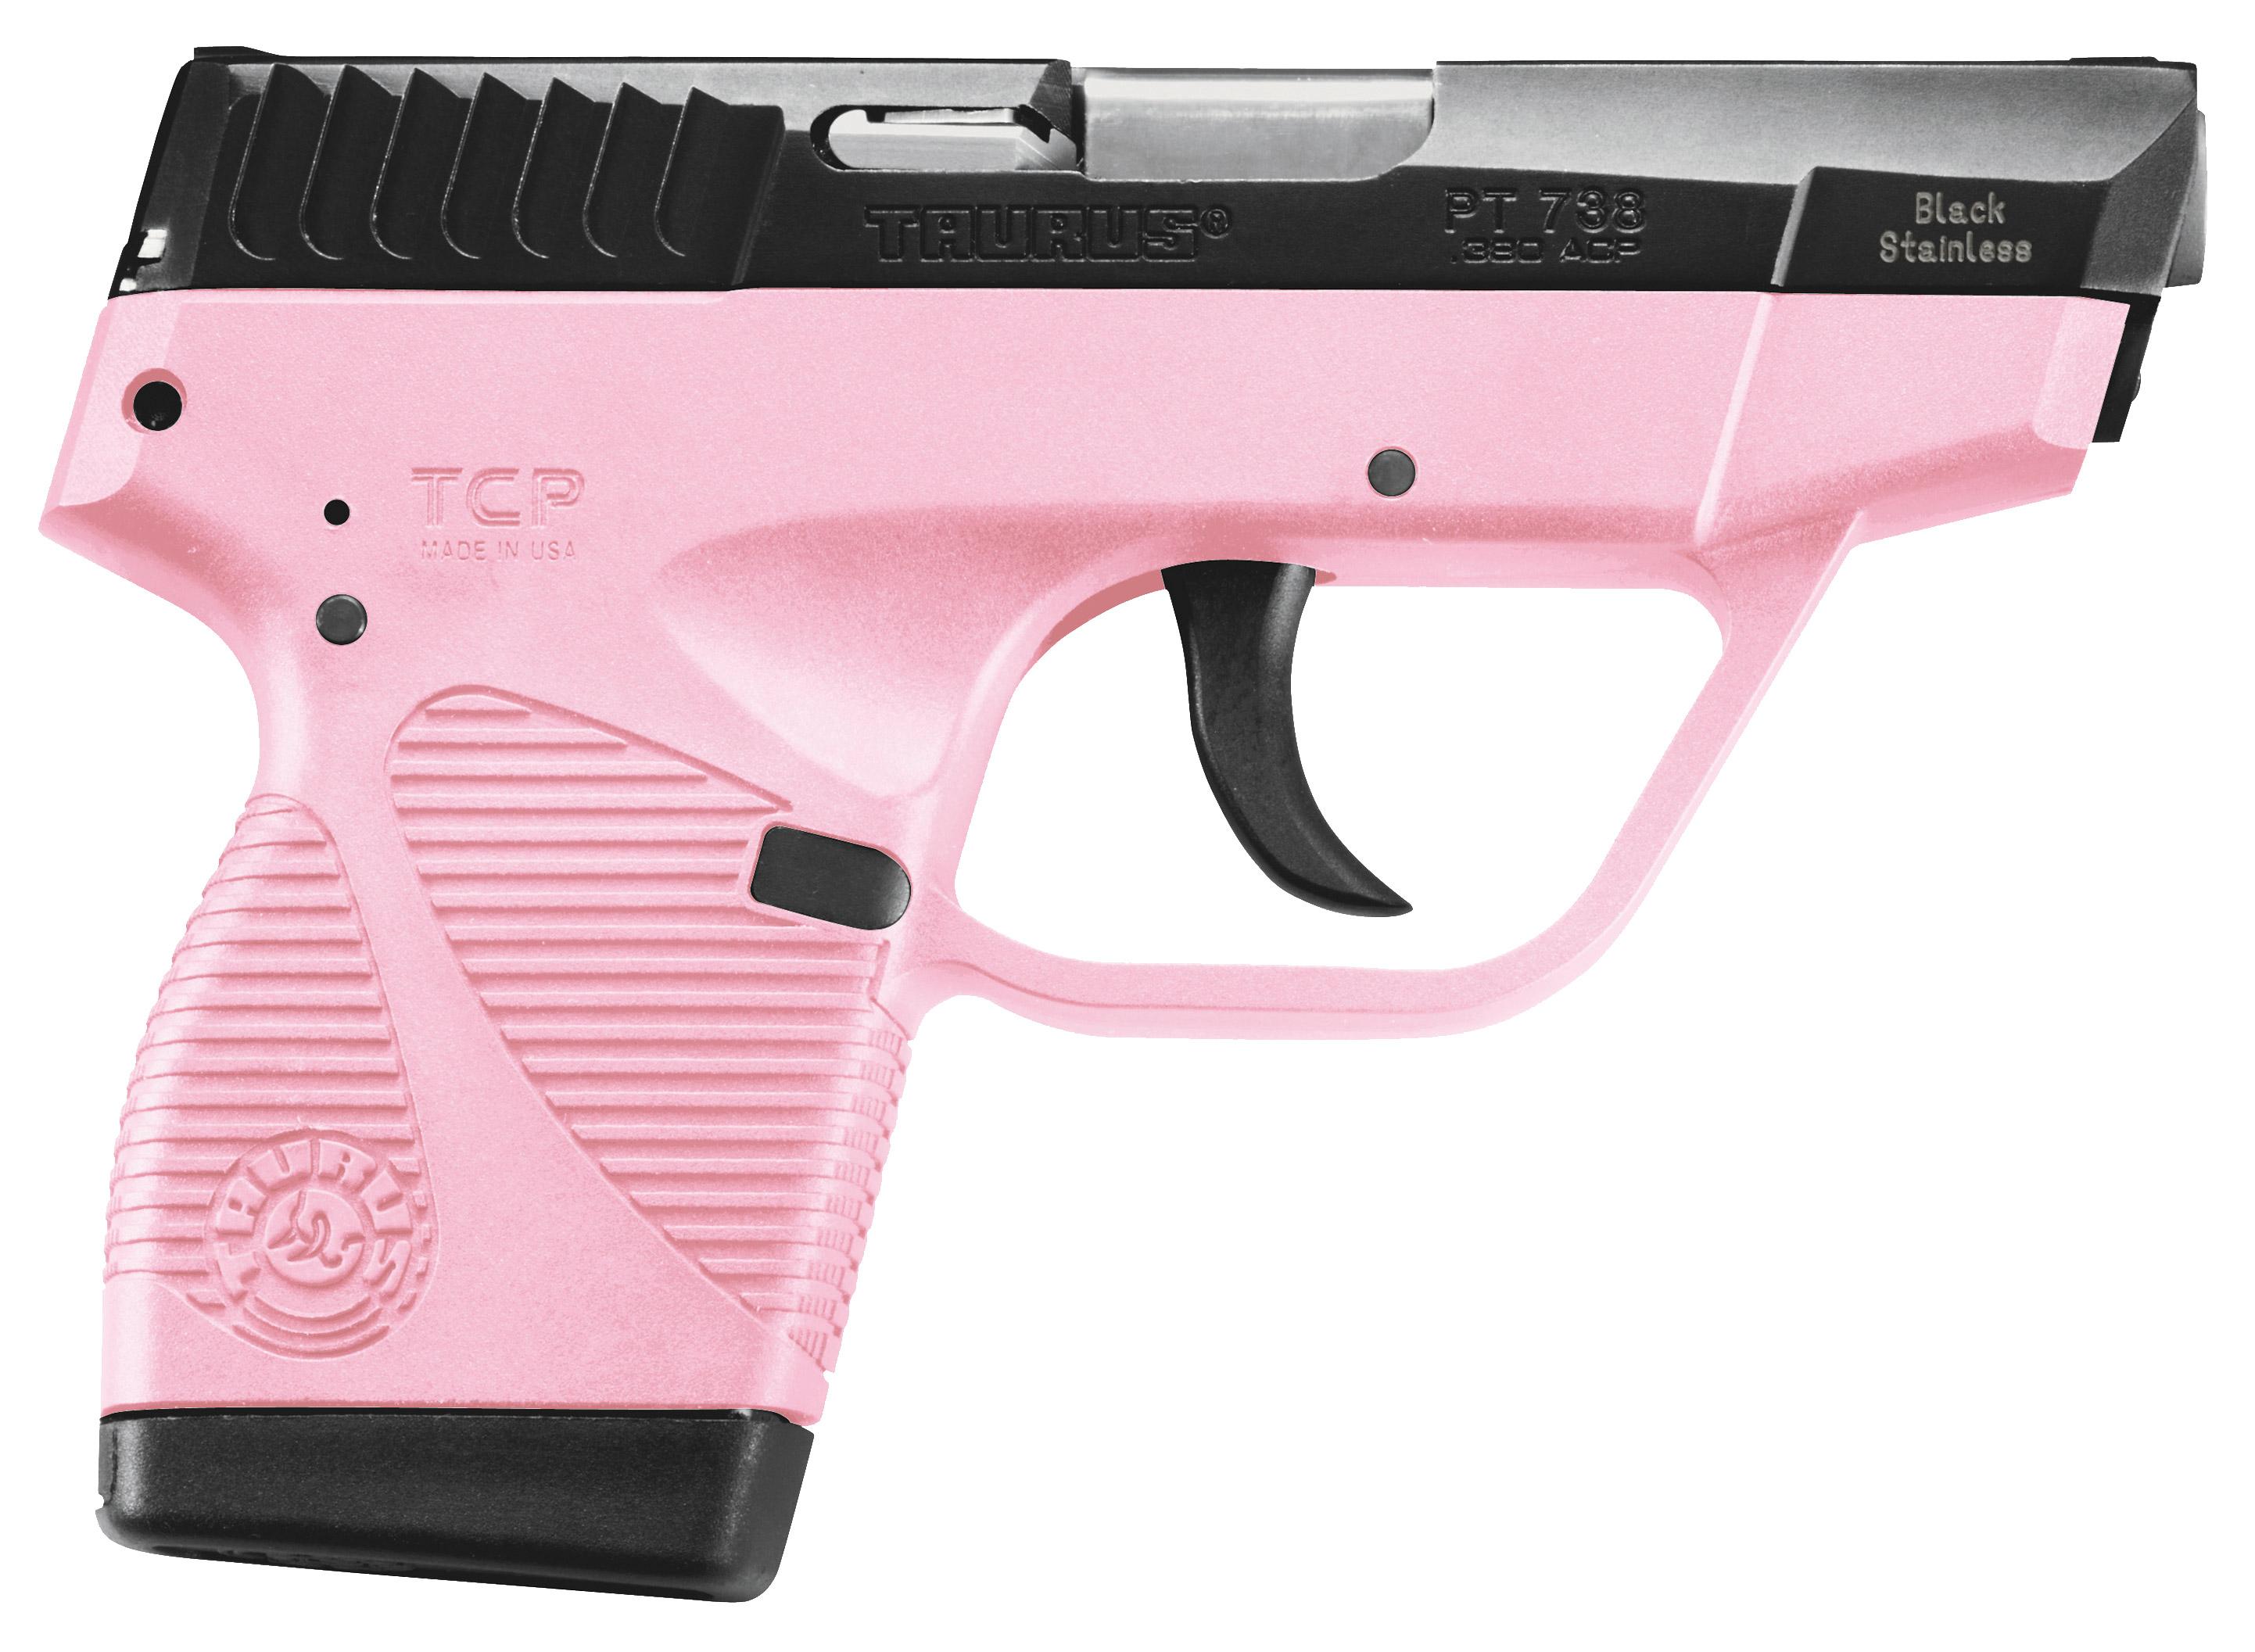 Pistola taurus 738 tcp pistolas taurus armas - Taurus mycook 1 6 precio ...